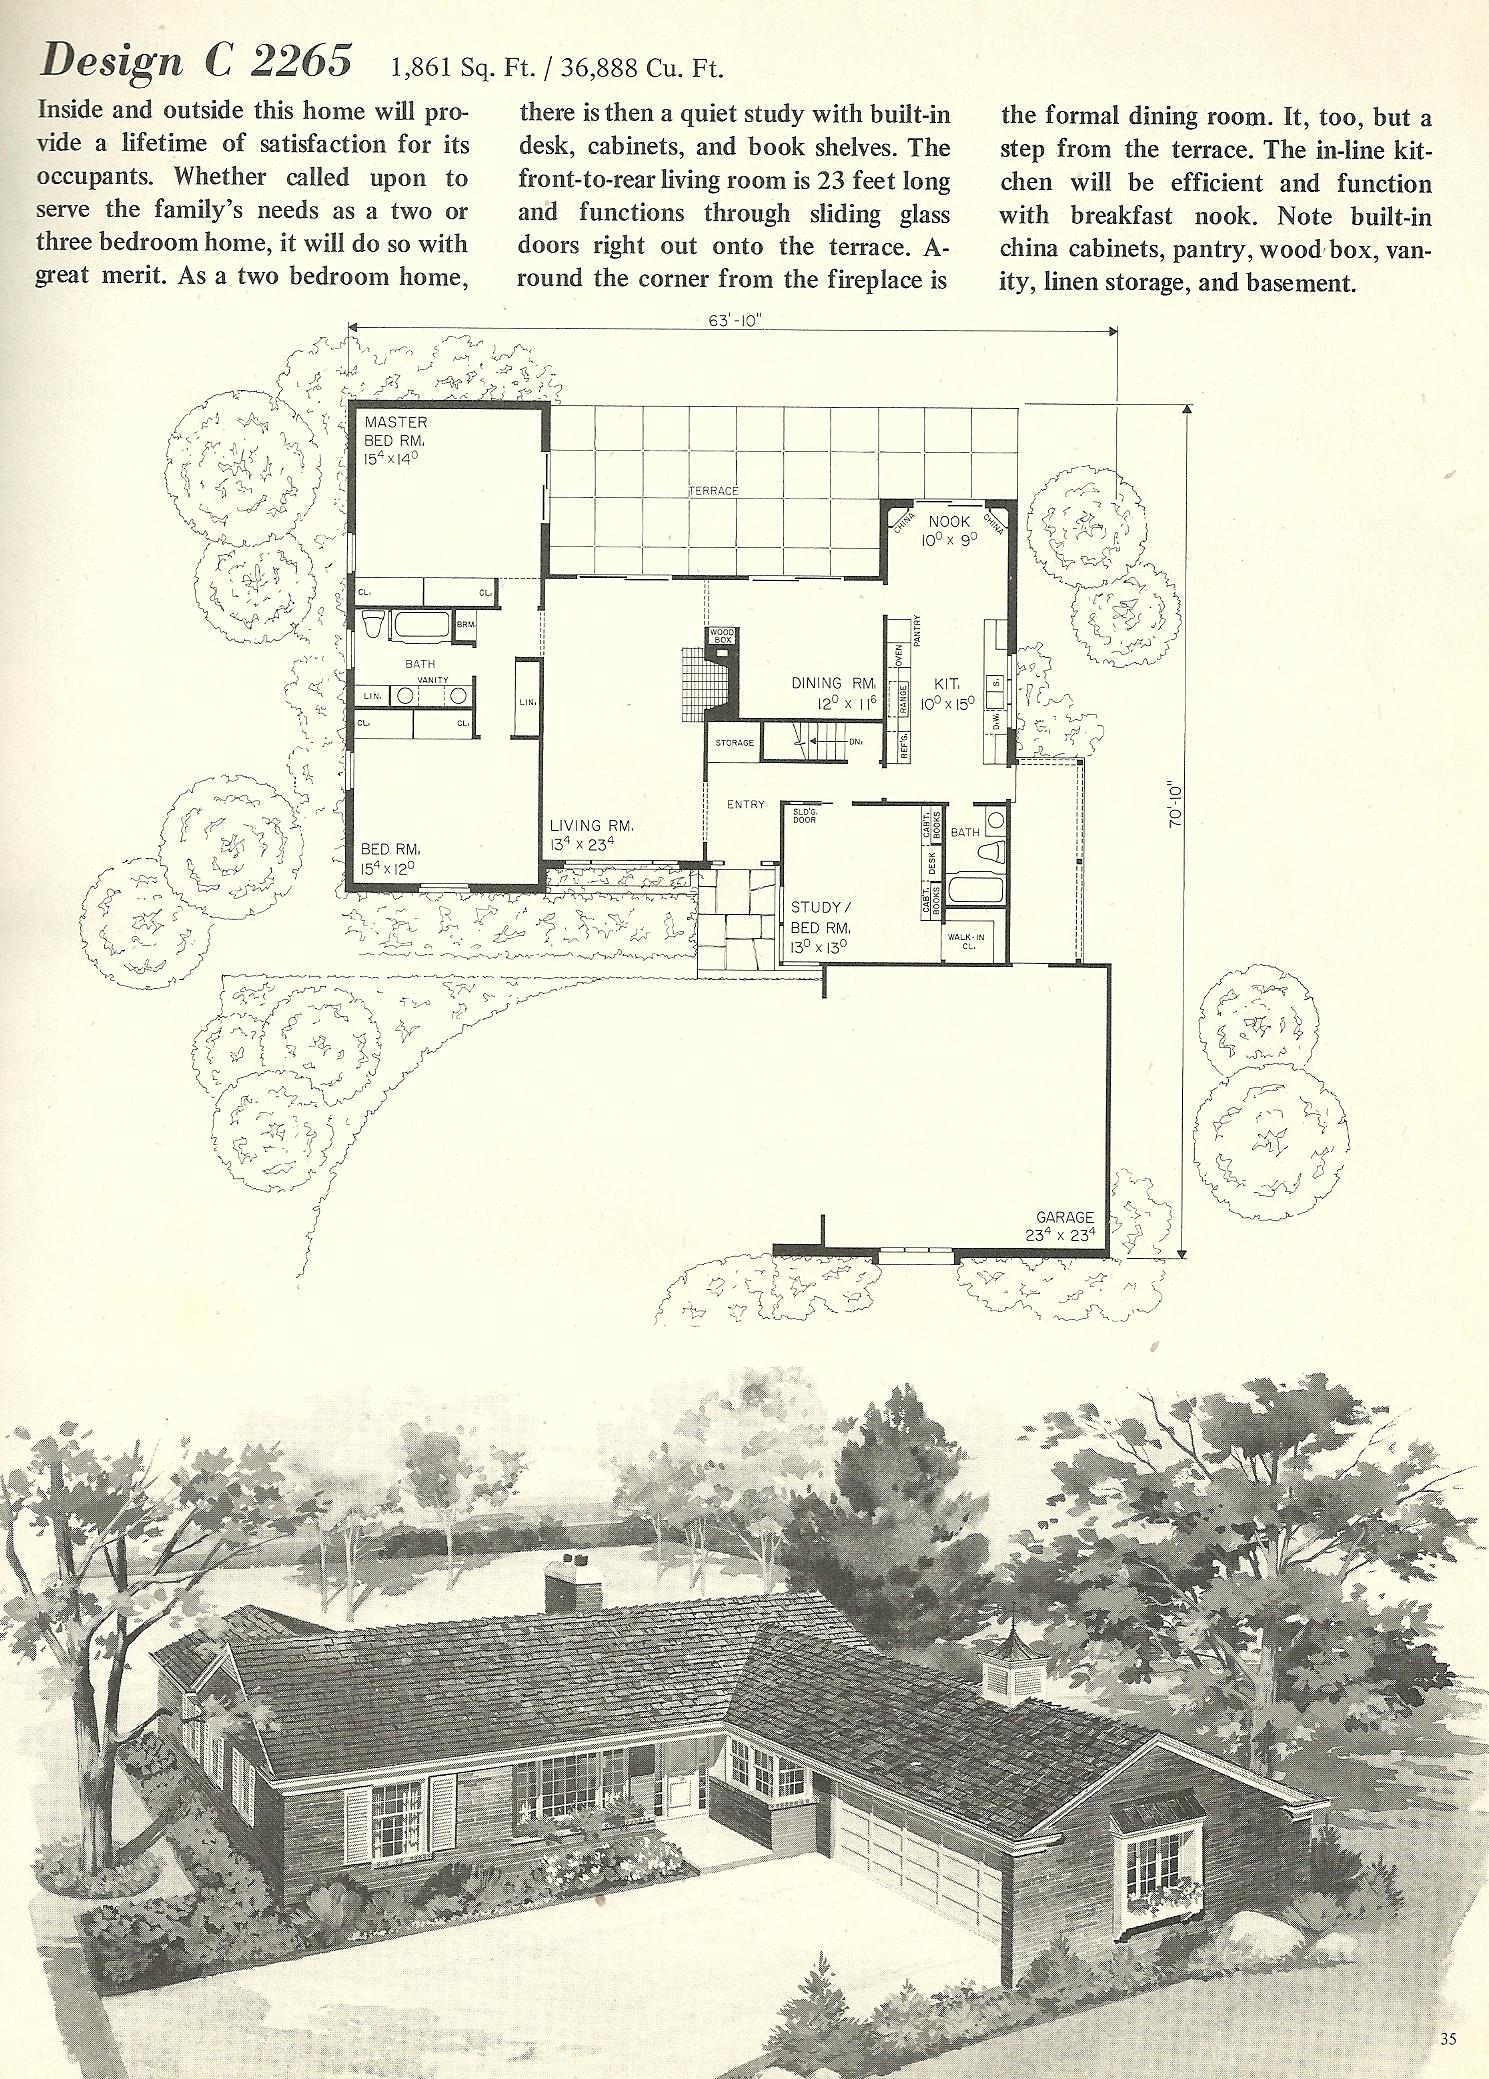 Vintage house plans 2265 antique alter ego for 1960s home floor plans